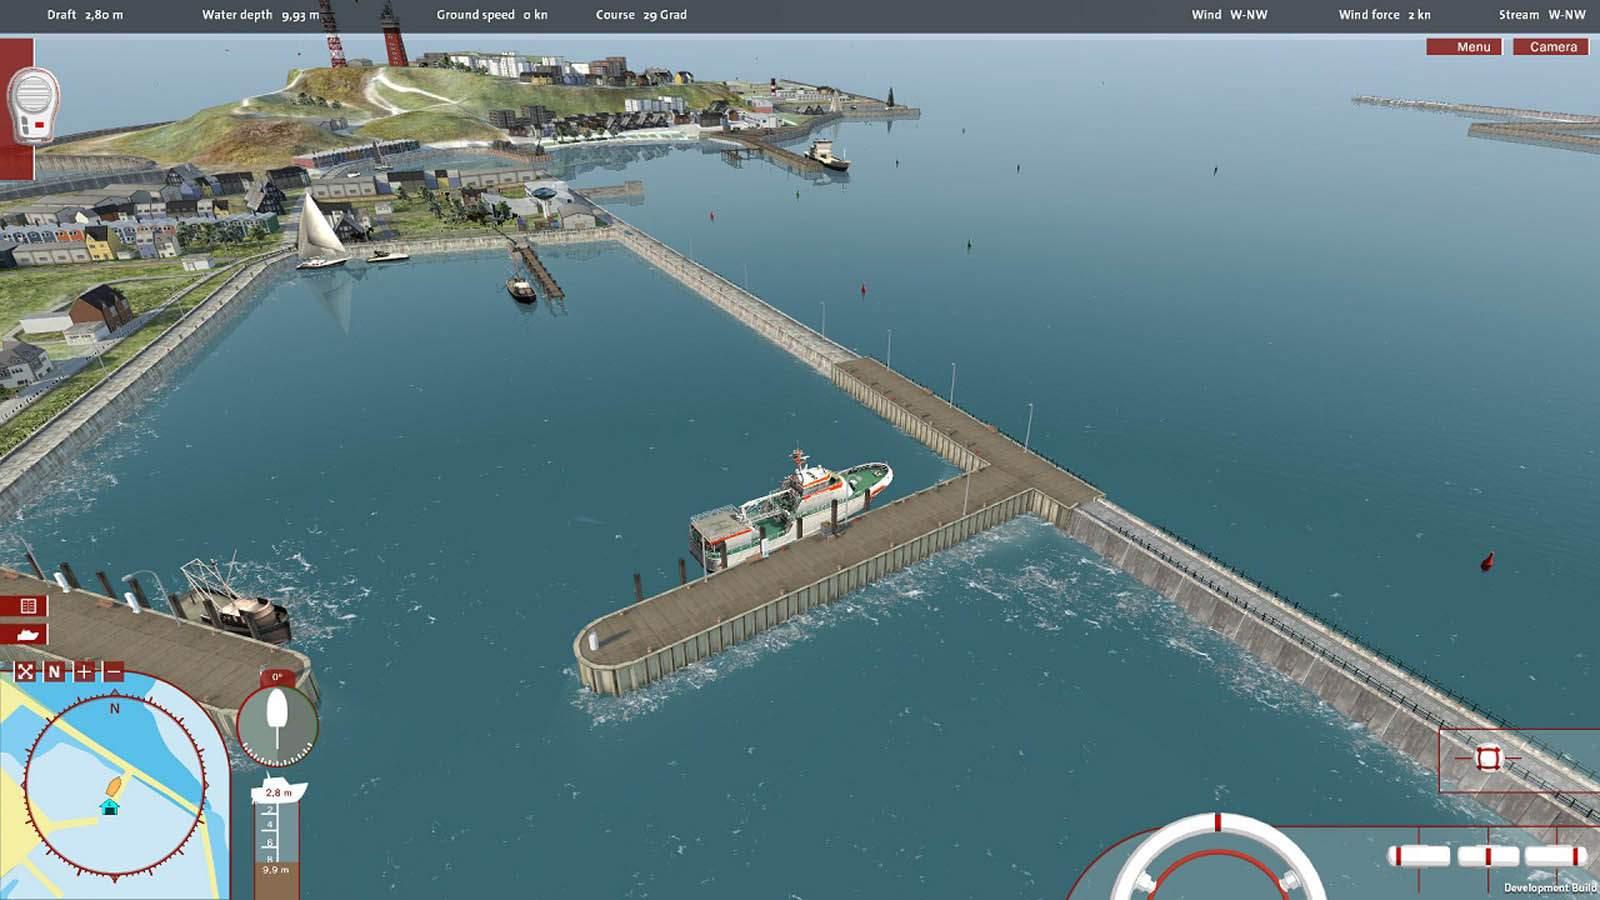 تحميل لعبة Ship Simulator Maritime Search and Rescue مضغوطة كاملة بروابط مباشرة مجانا